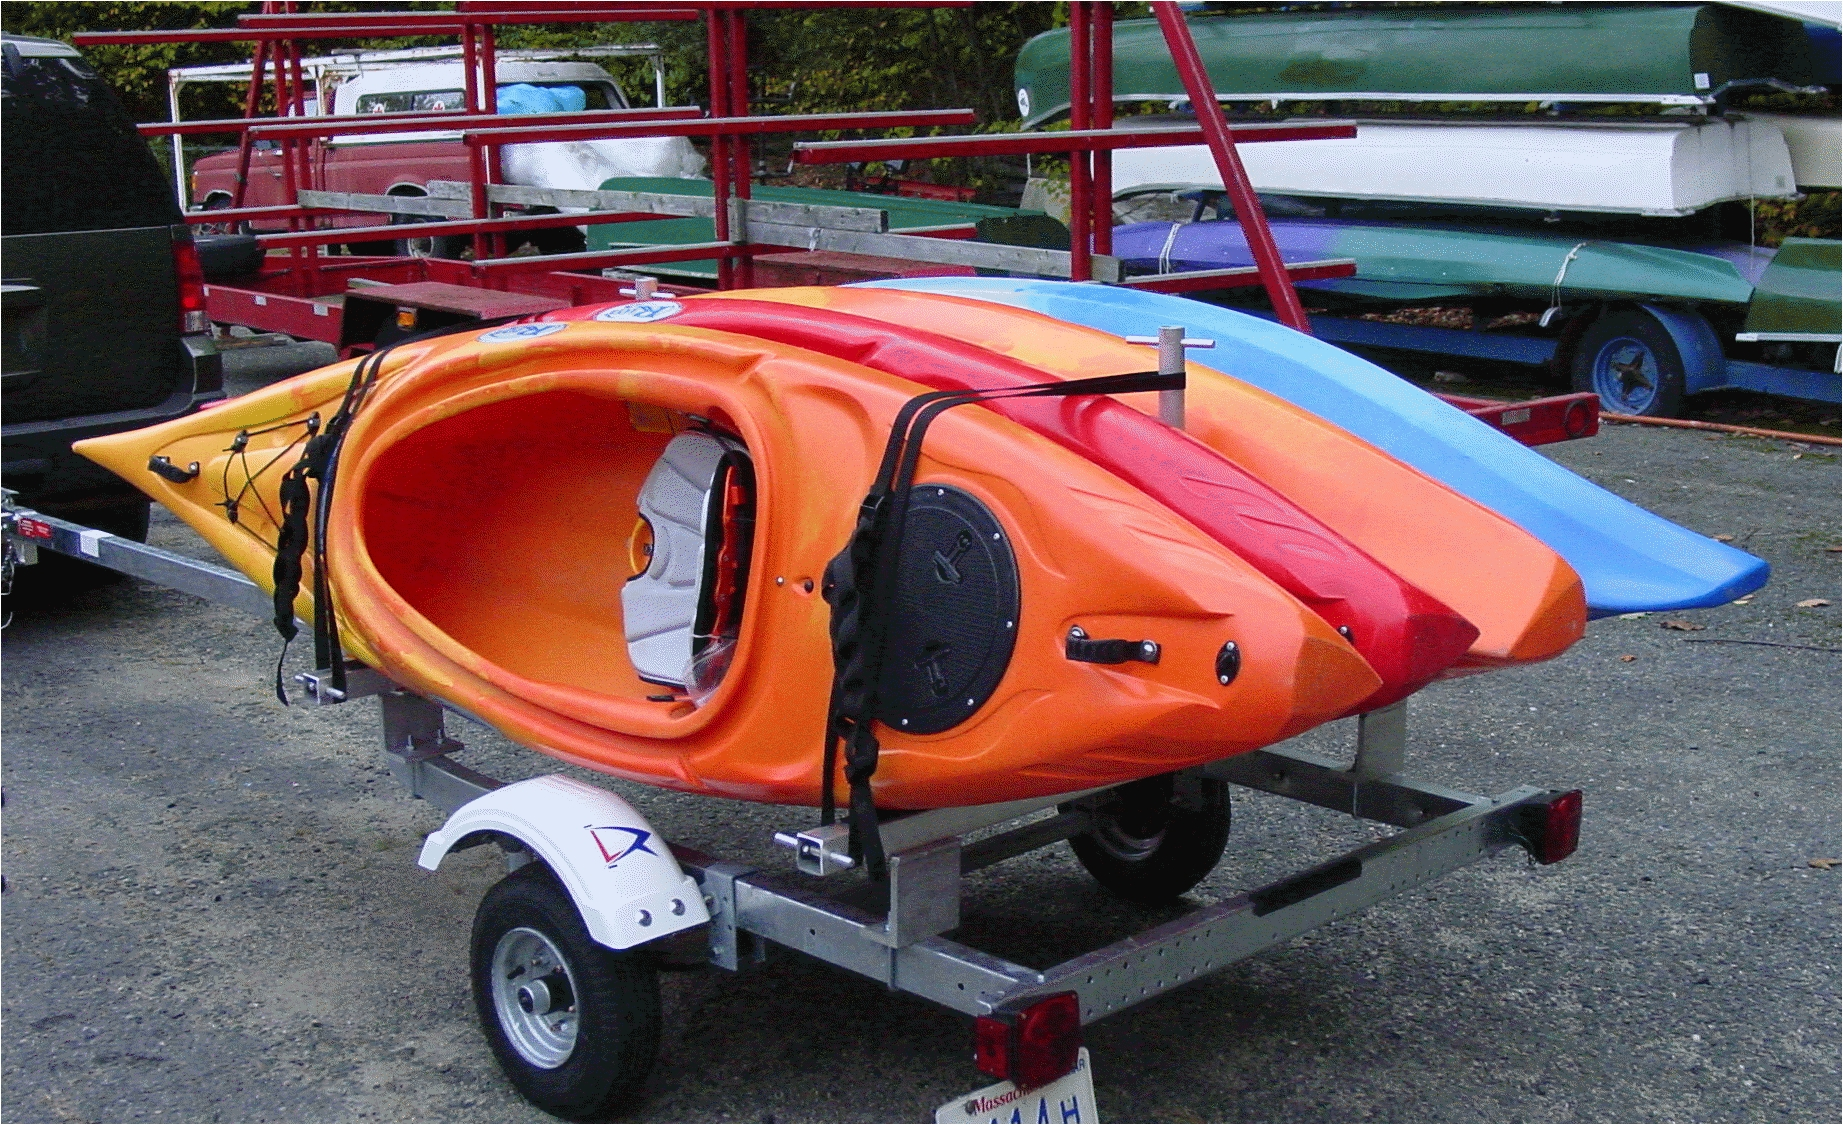 kayak trailer rack single tier 4 kayaks rack kayak 4 kayaks